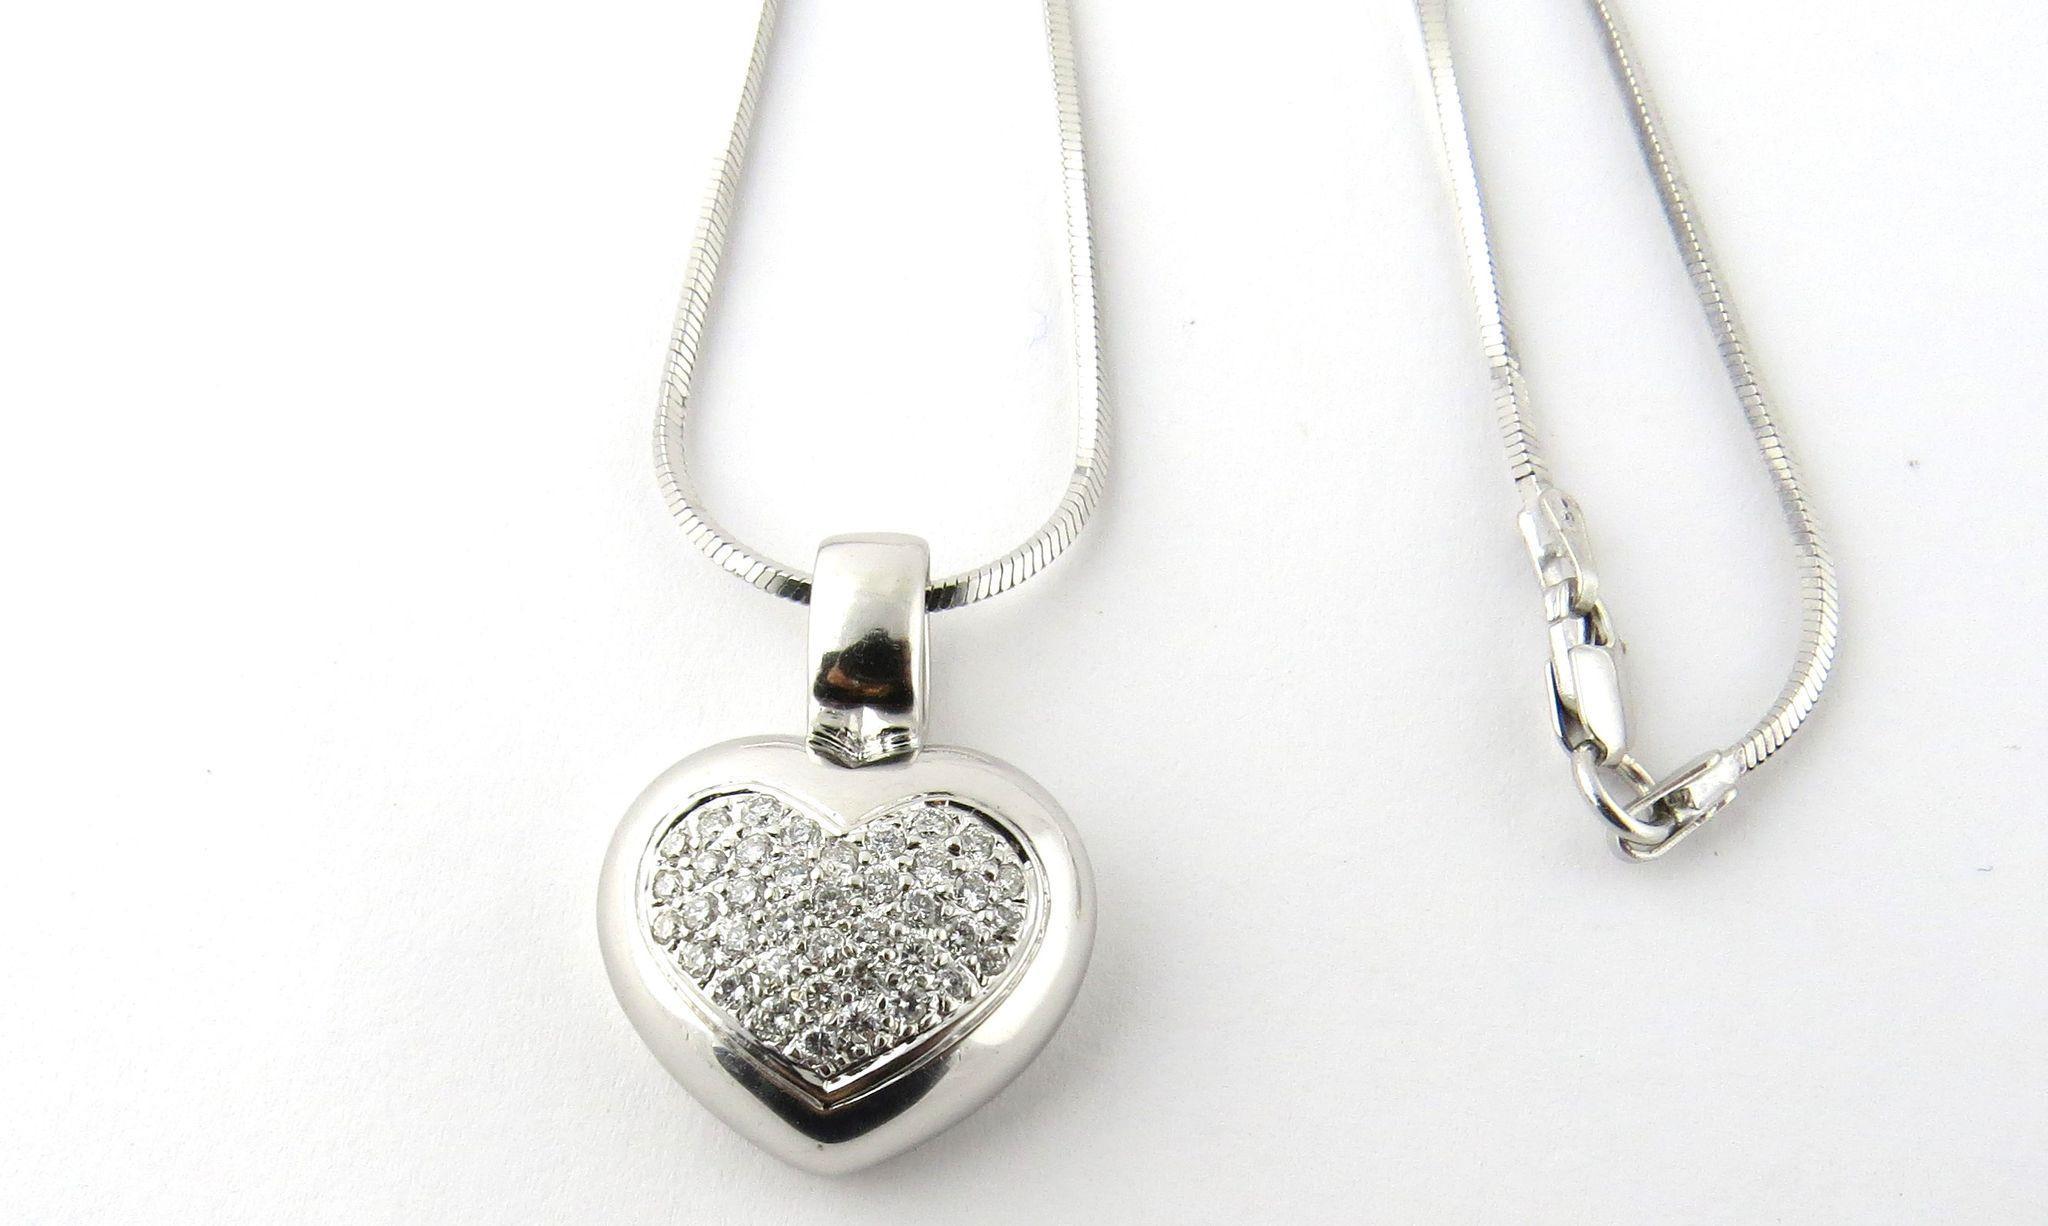 Vintage 18K White Gold Diamond Heart Pendant Necklace Snake Chain